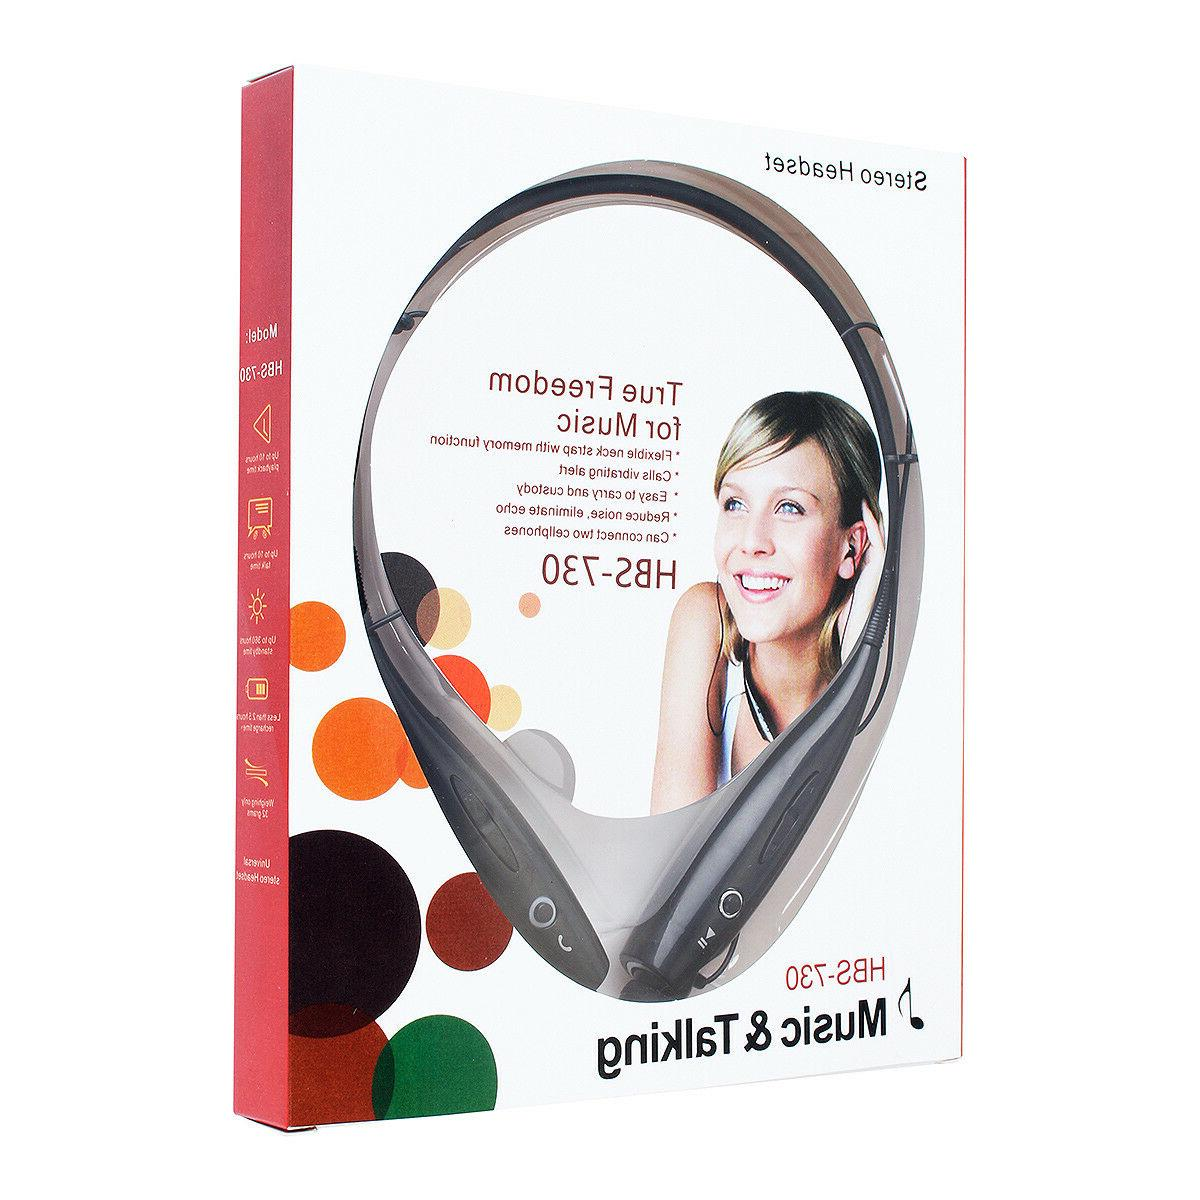 Wireless Earphone Neckband Earbuds Mic USA